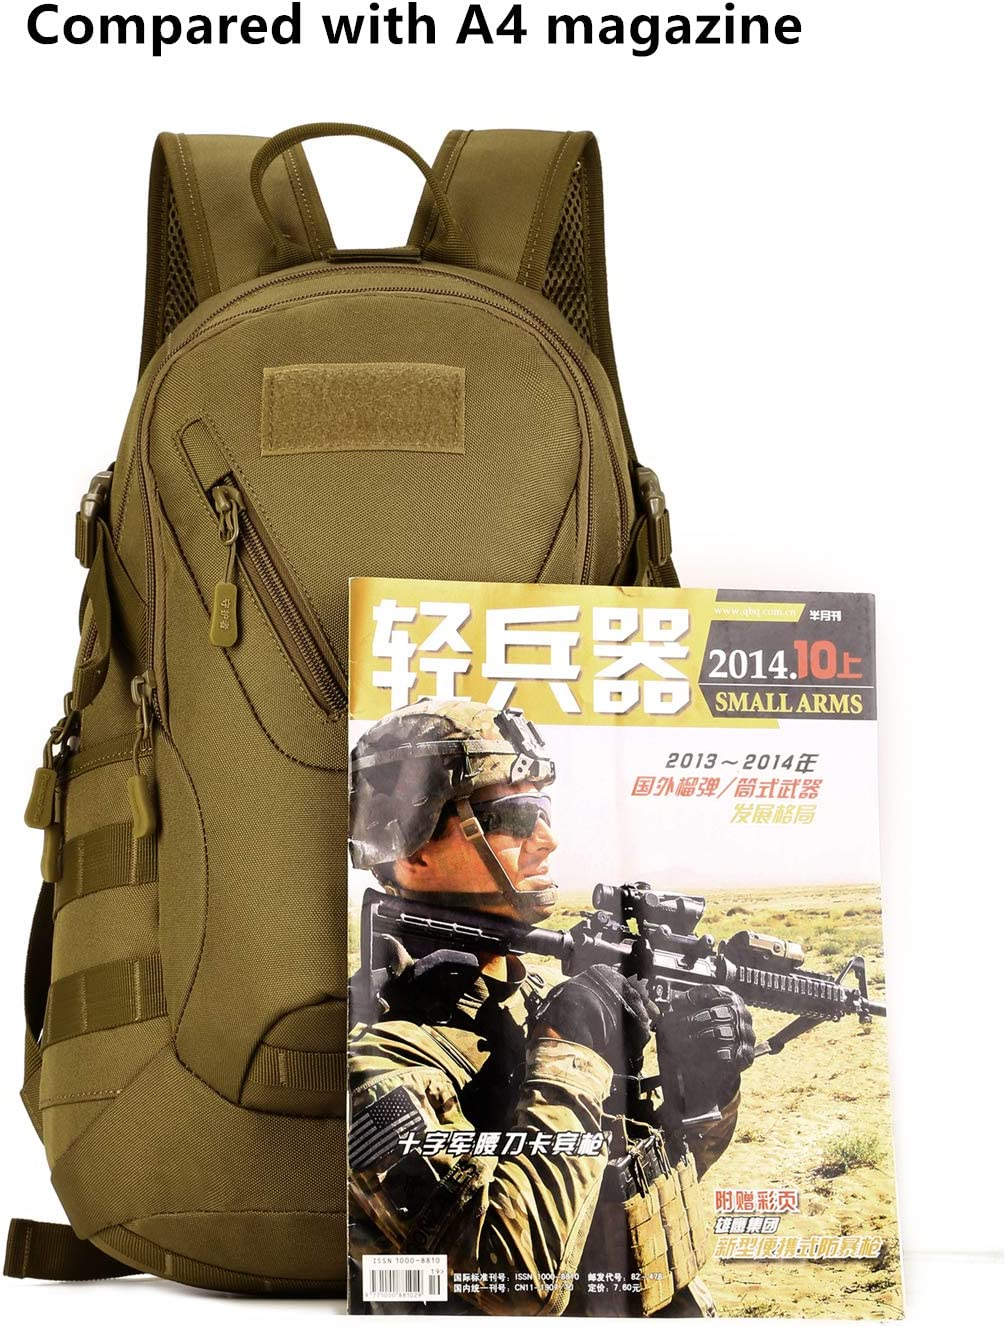 Yakmoo Mochila de Asalto 20L Estilo Militar Táctico Molle Sistema Bolsa de Estudiante Impermeable al Aire Libre